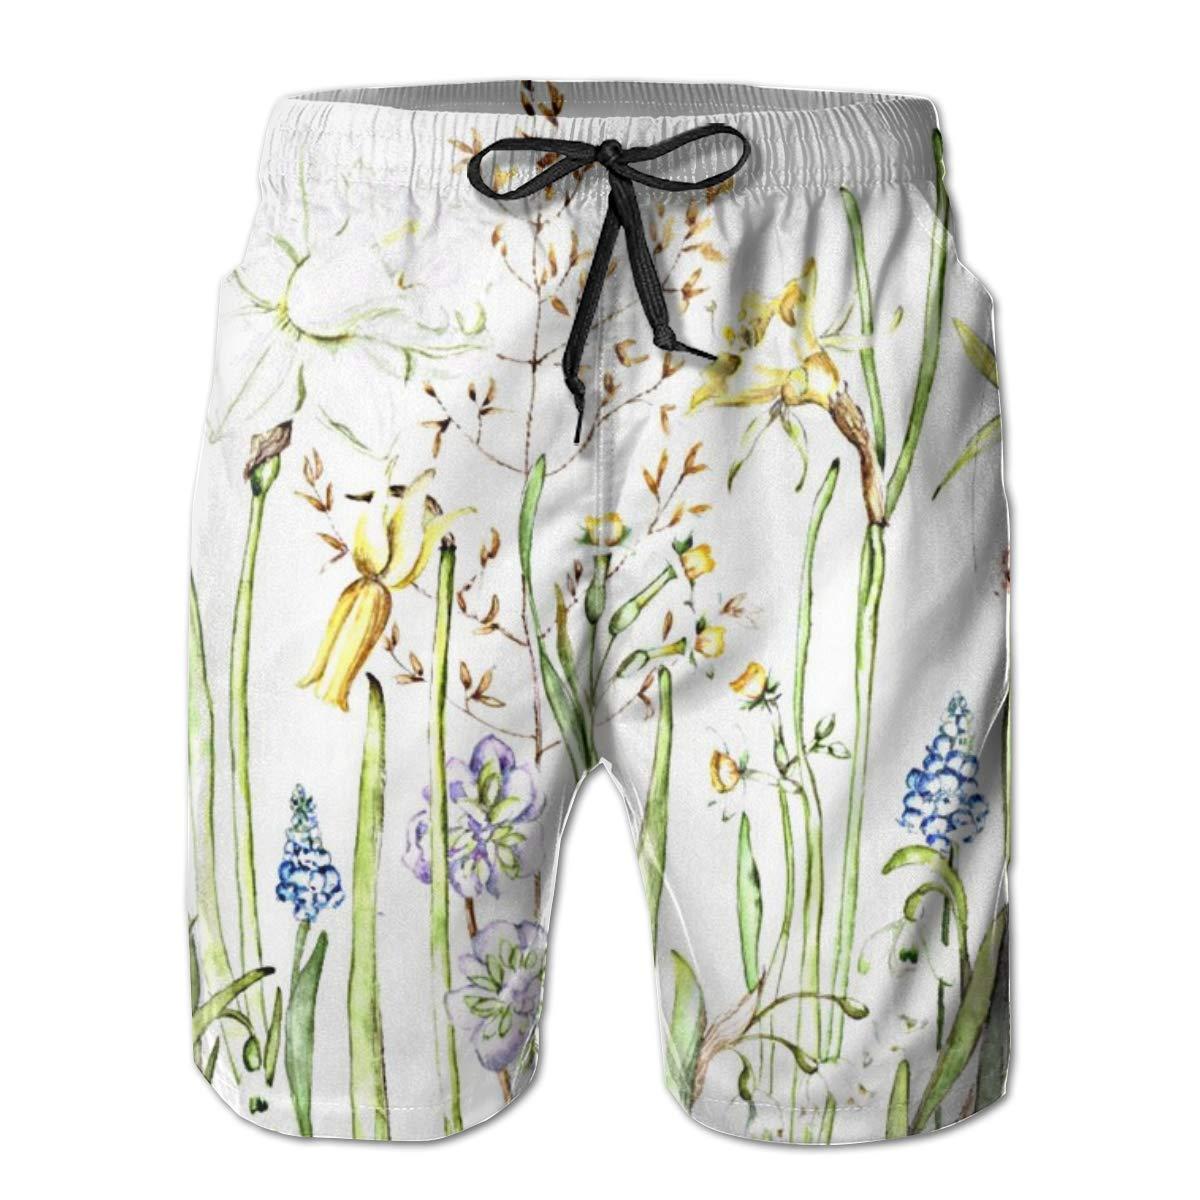 Galaxy Voyage Spring Flowers Boys Mens Swim Trunks Surf Pants 3D Swimming Trunks Board Shorts for Men